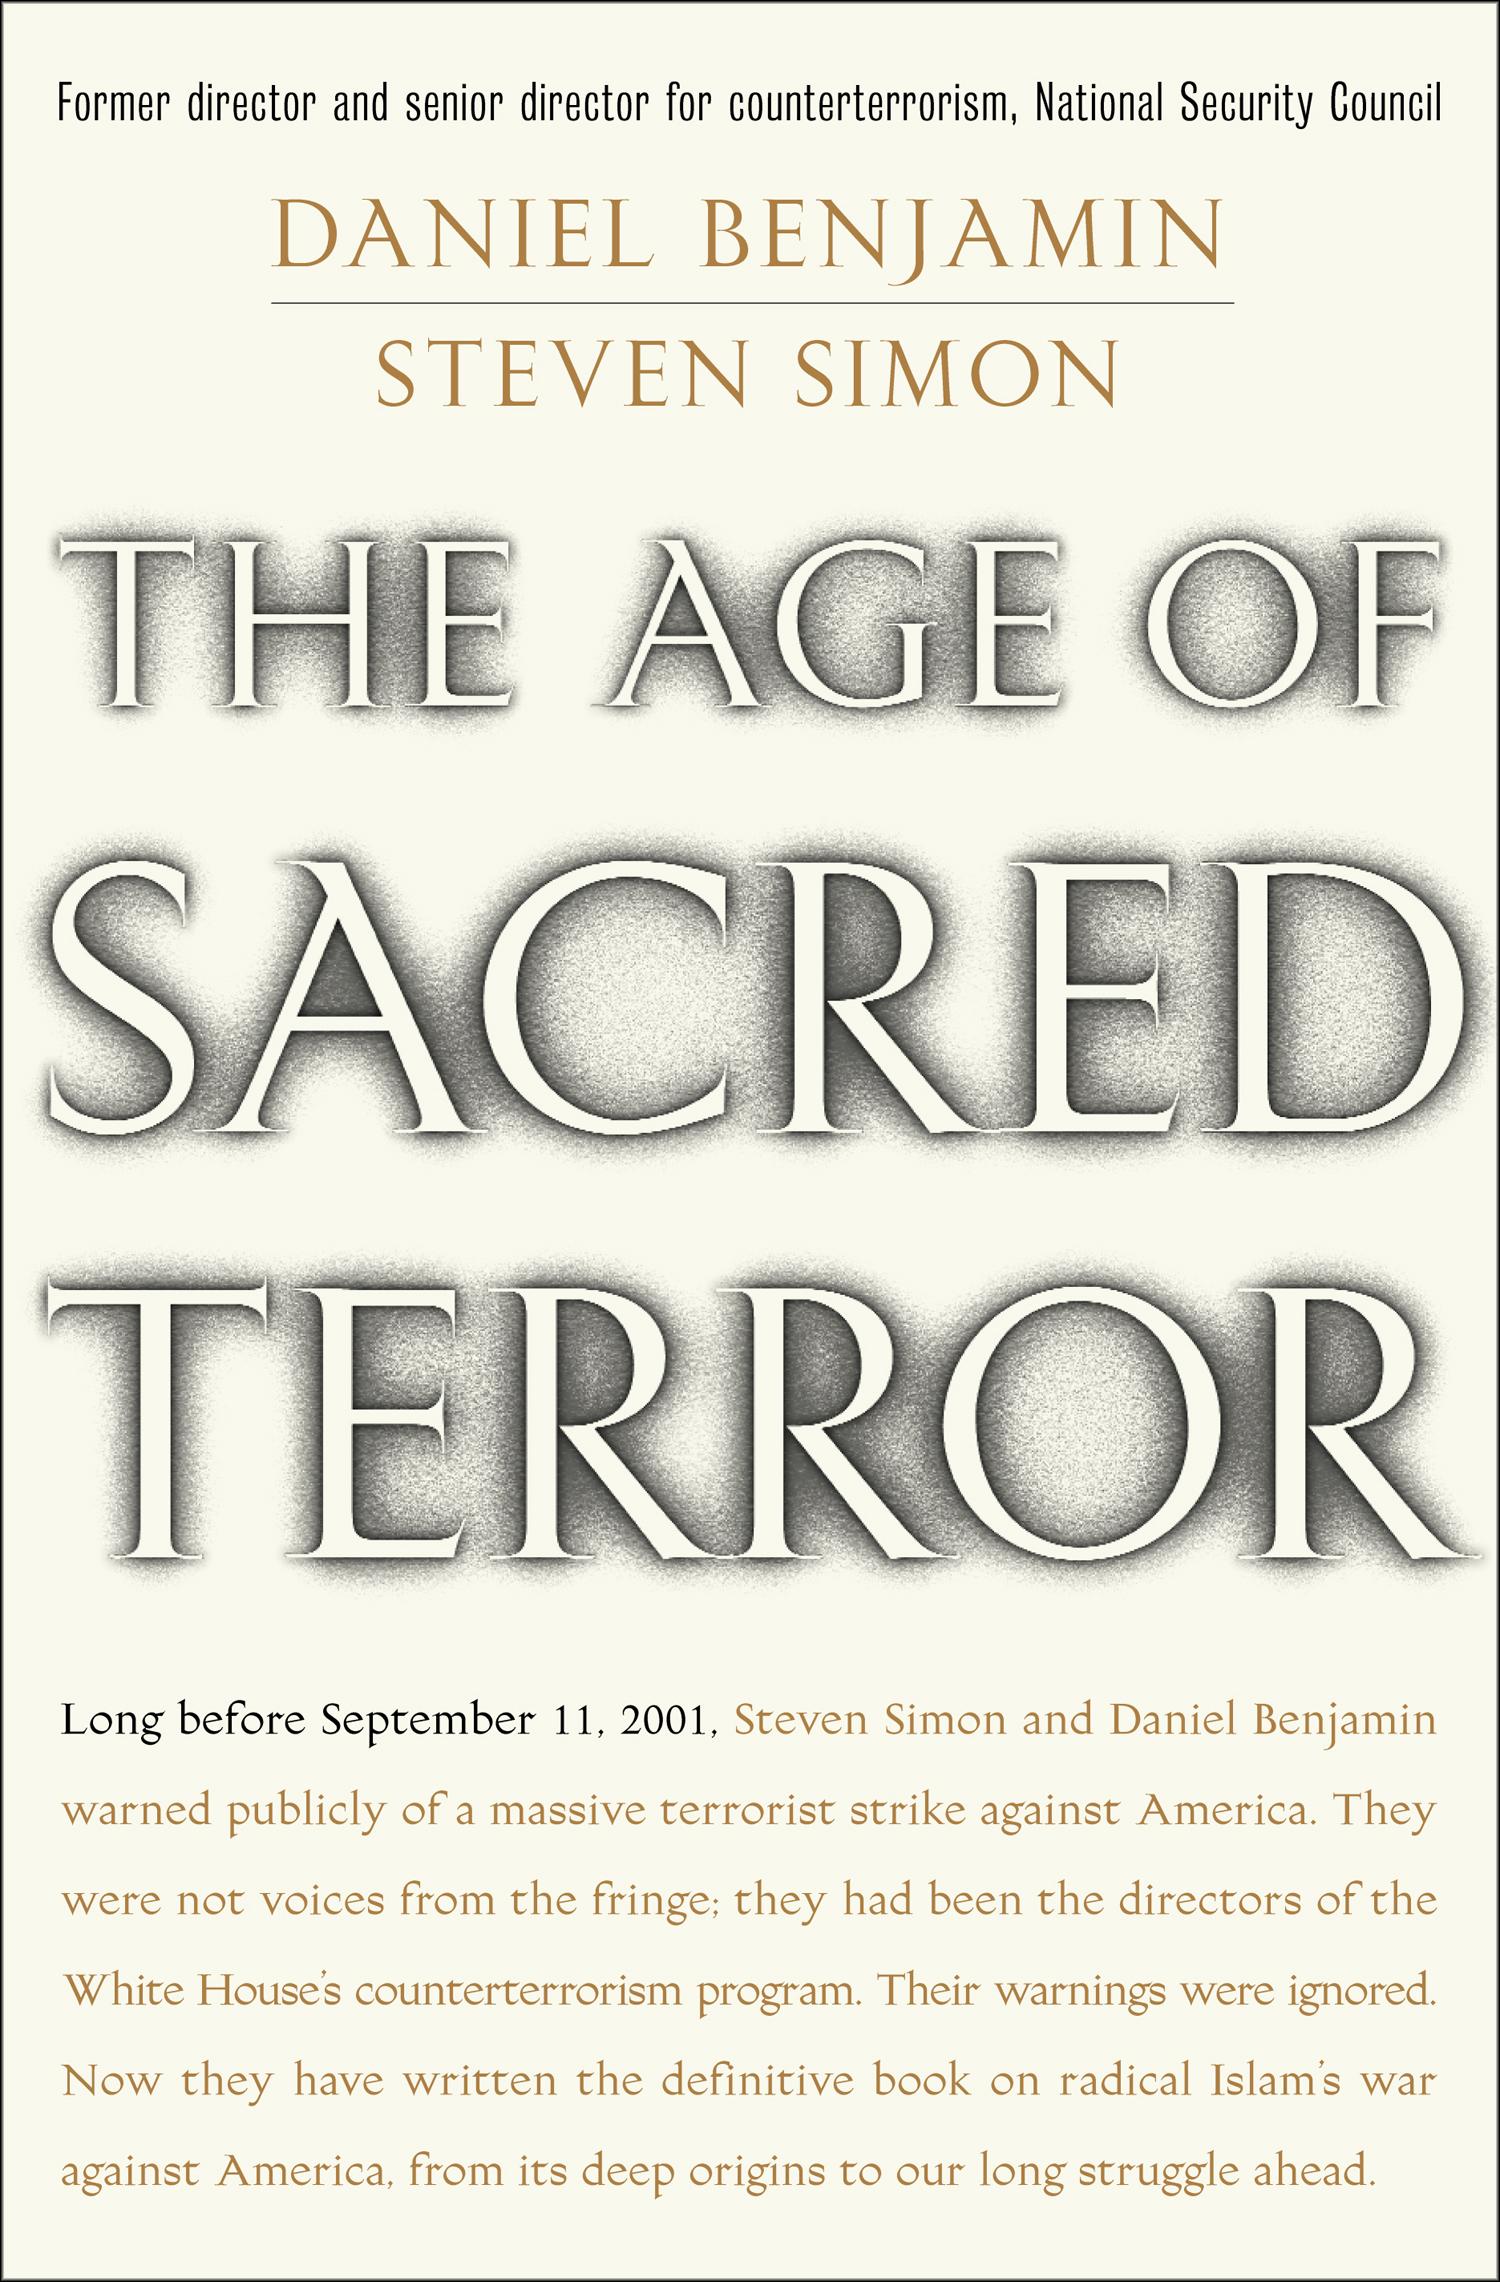 THE-AGE-OF-SACRED-TERROR-hc-ss6.jpg